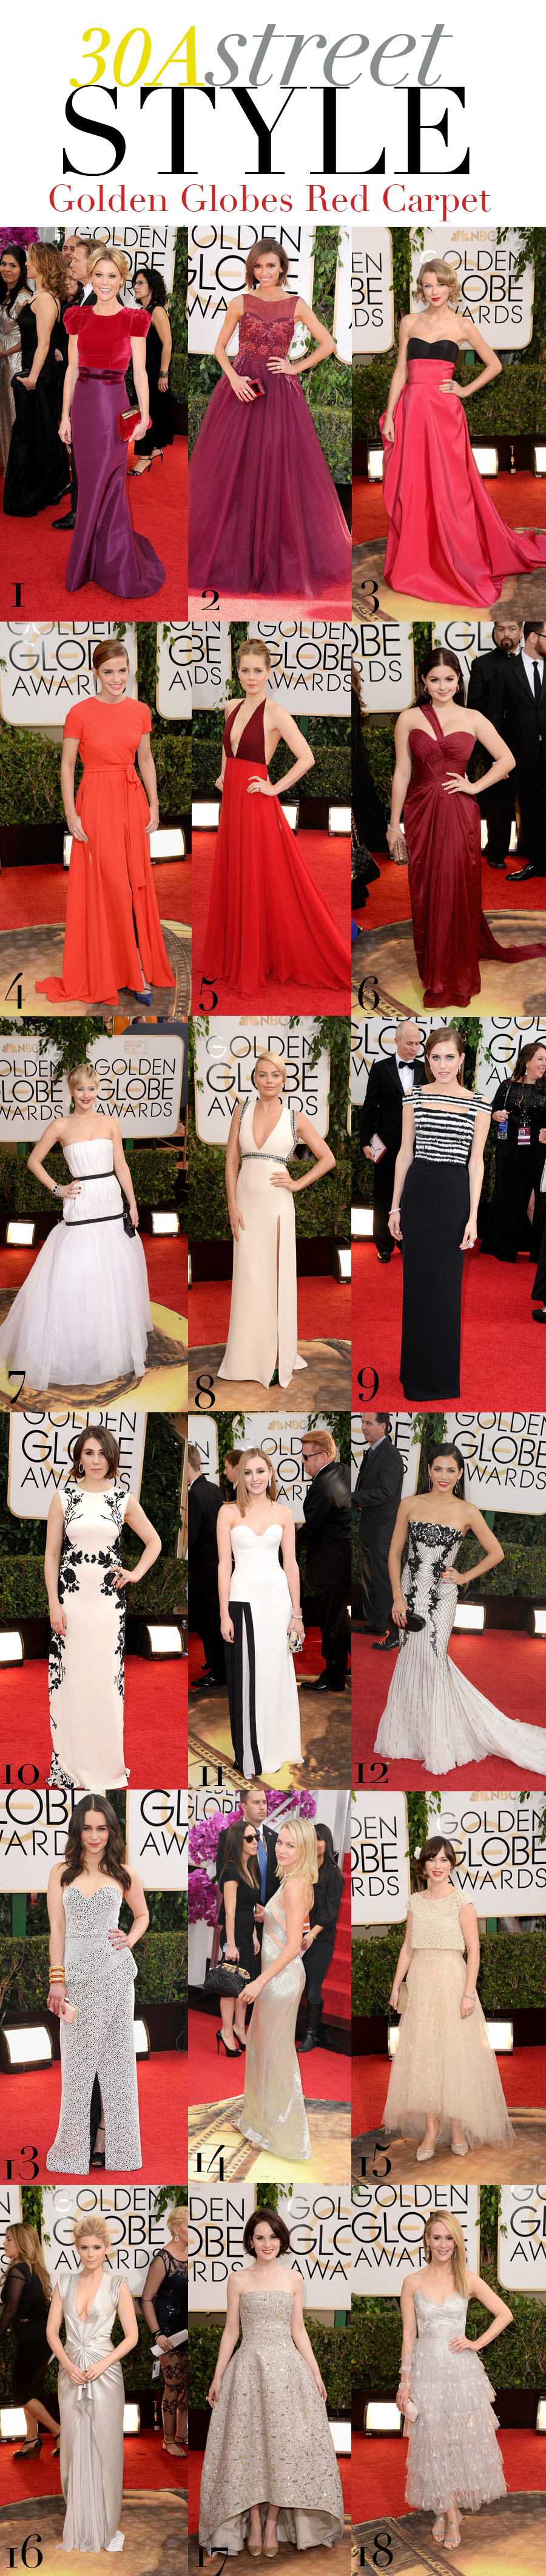 Red Carpet Recap - Golden Globes 2014